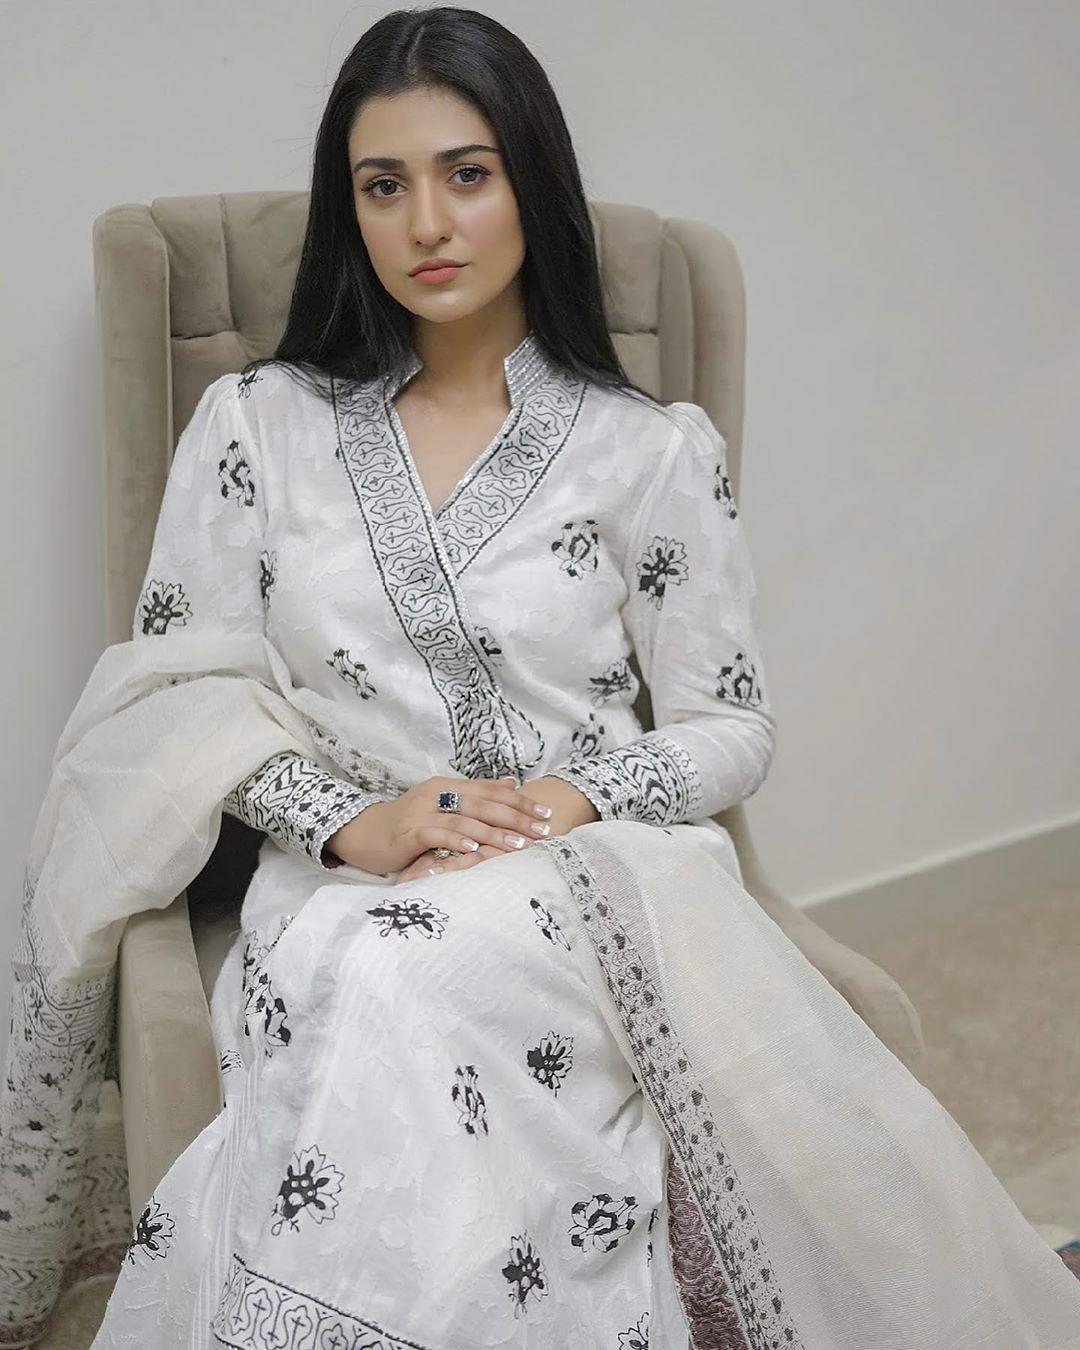 Sarah Khan New Random and Naturally Beautiful Pictures